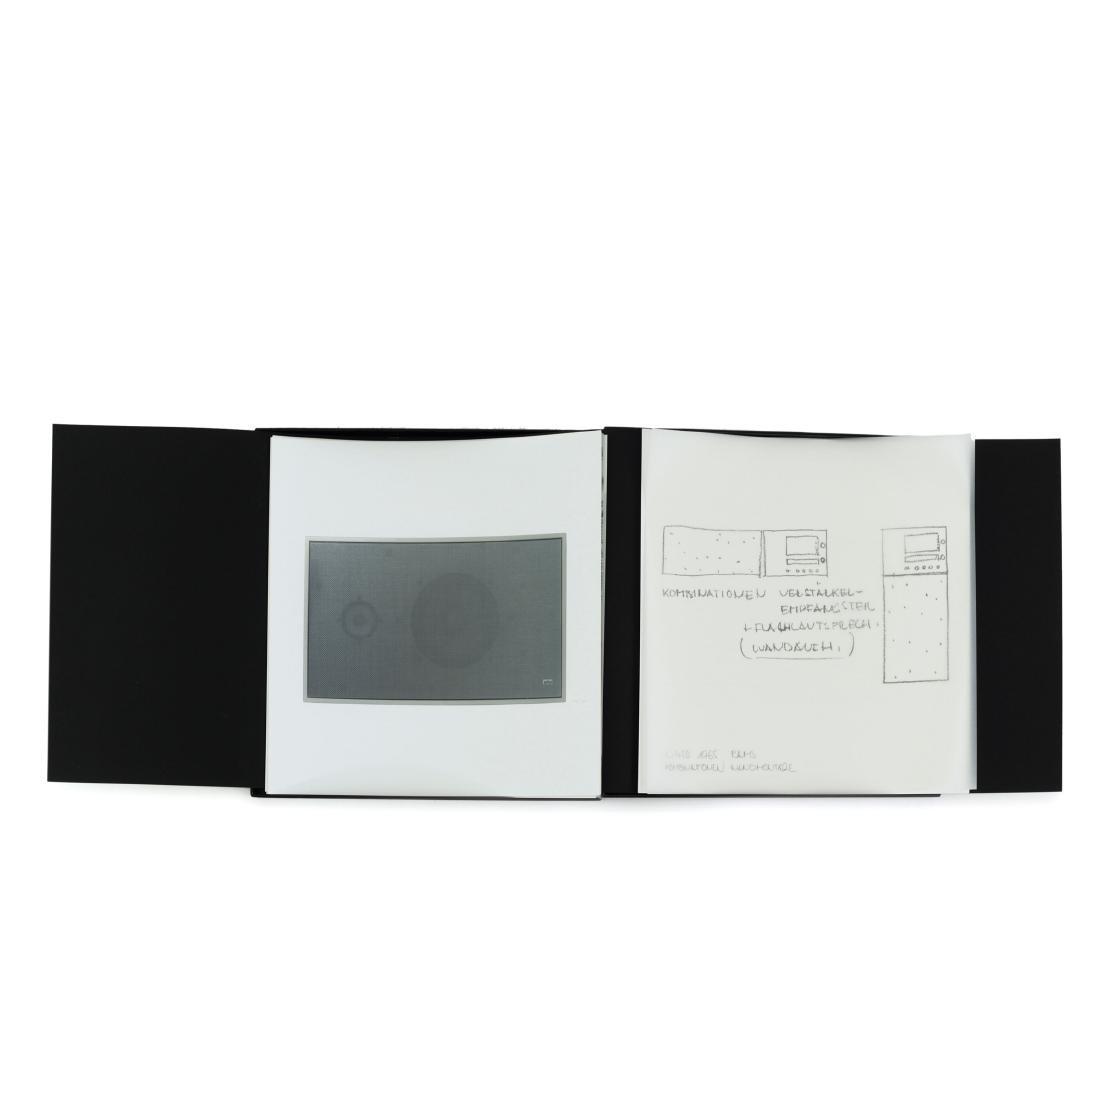 'Atelier Last Edition' book, 1991